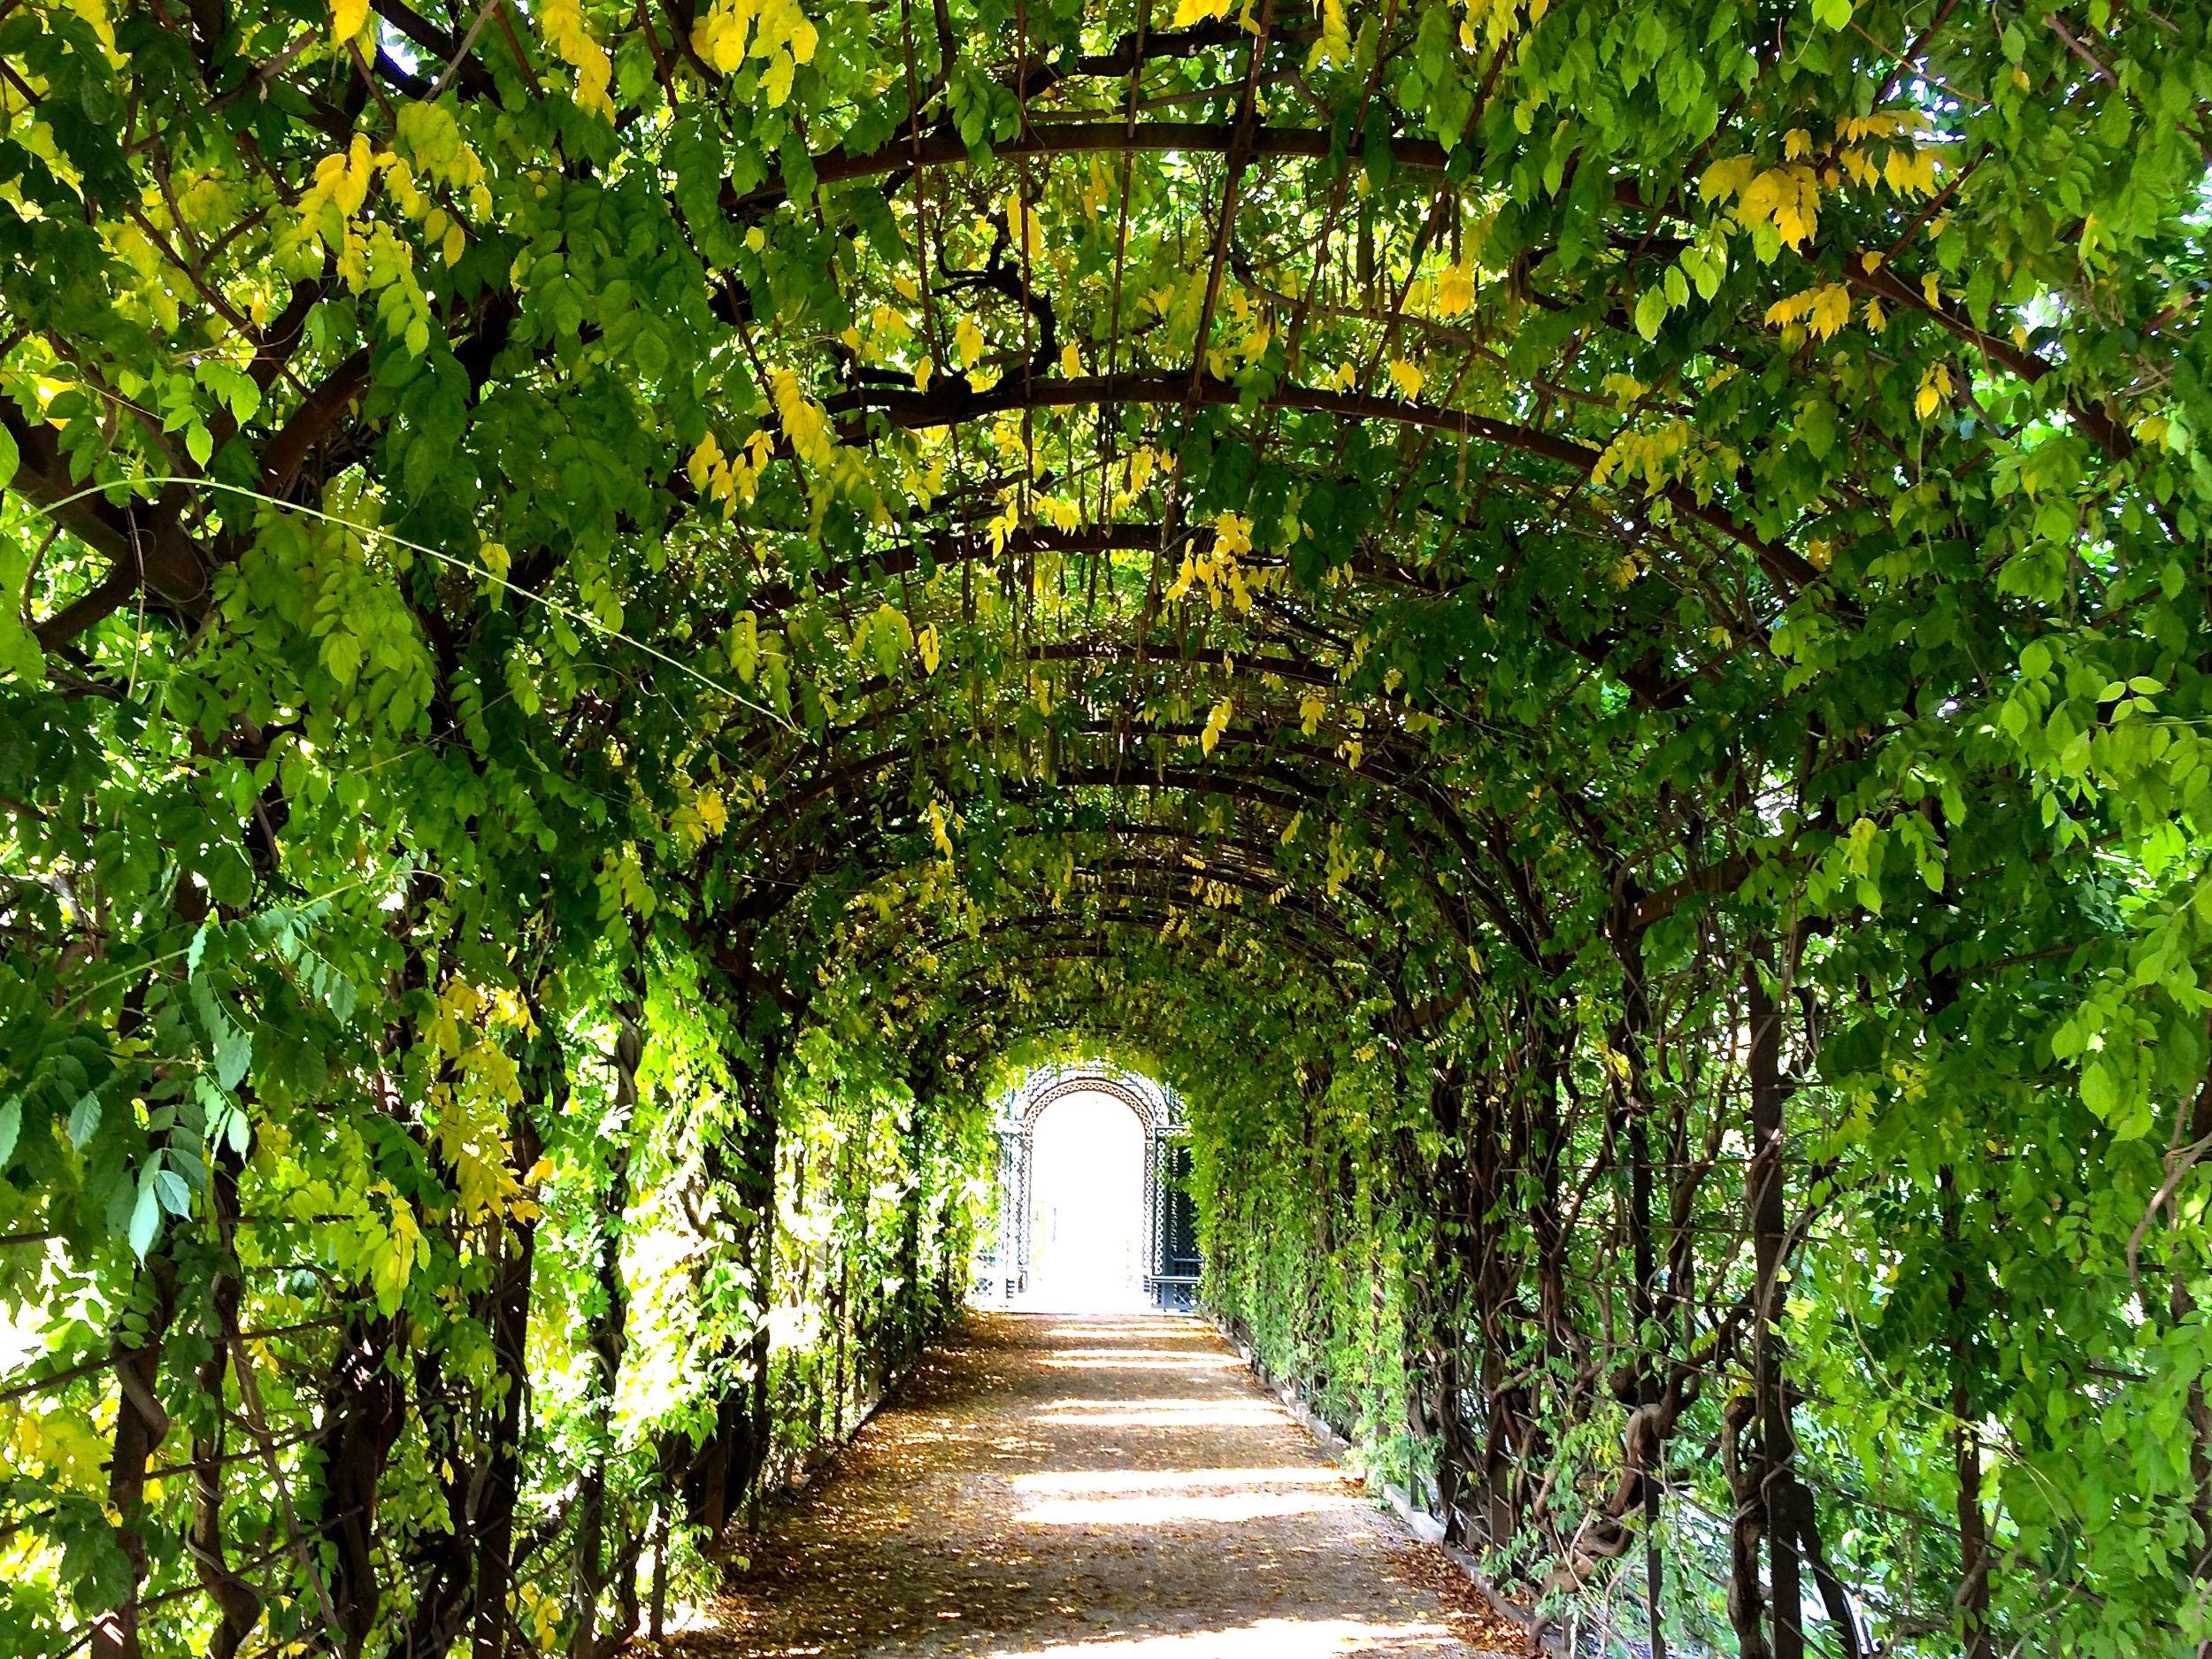 Walk through these vines. I implore you.